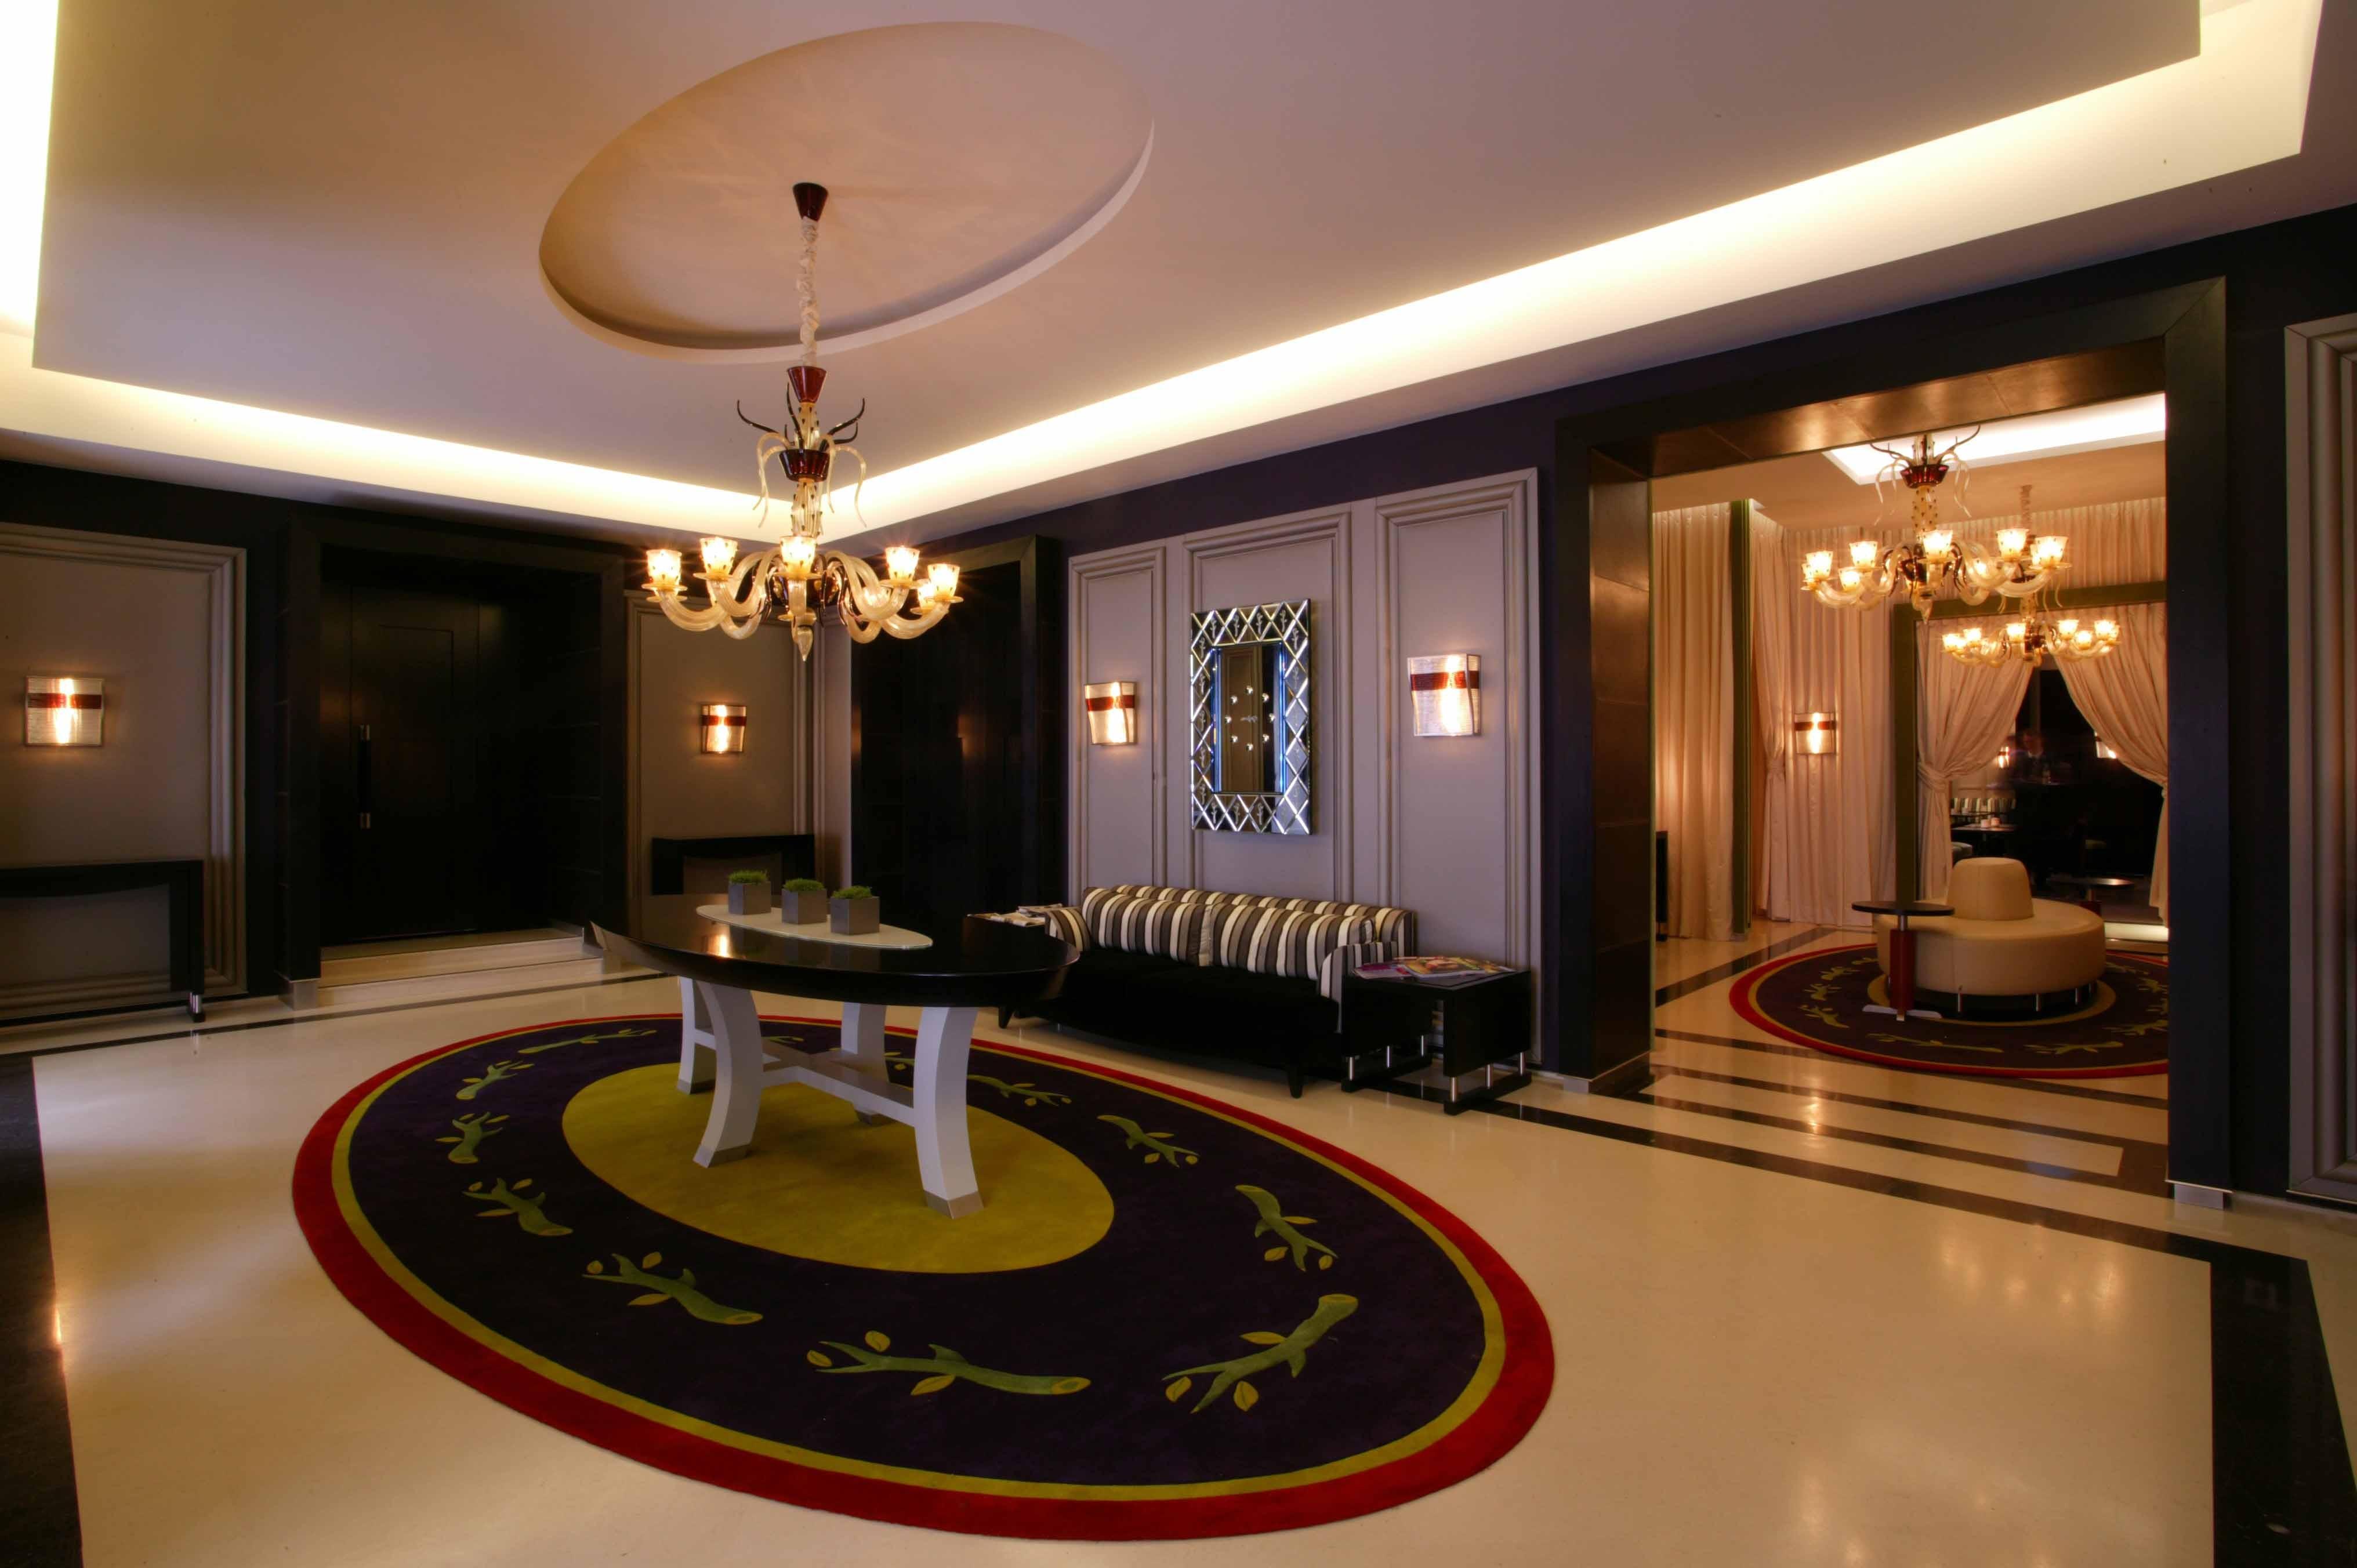 marignan-hotel-olivier-gagnere-veronese-1